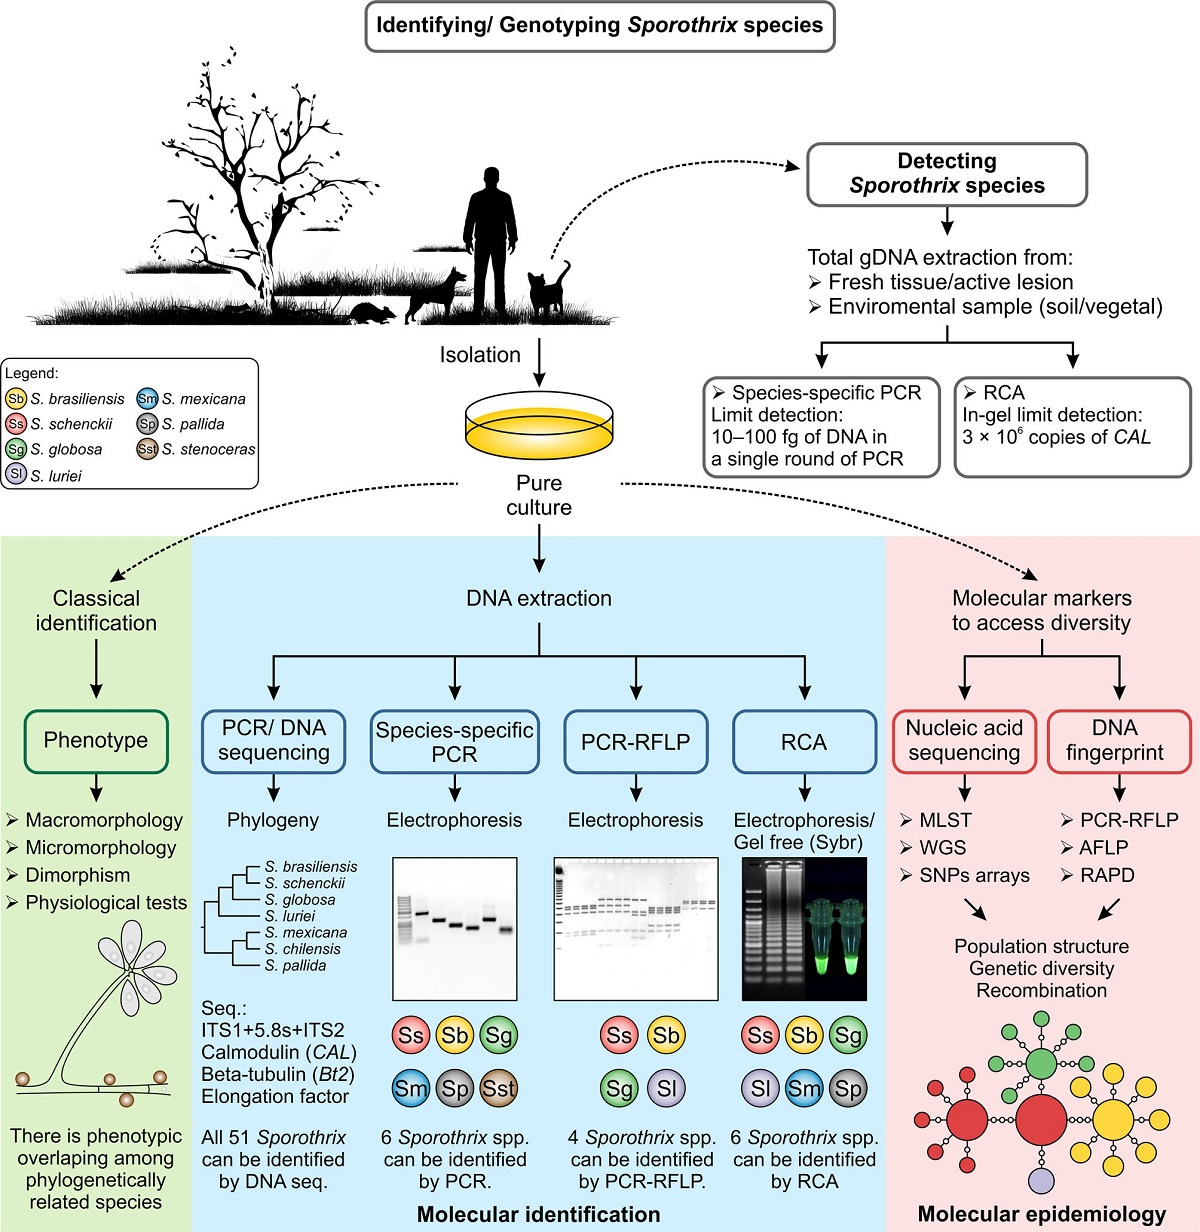 Diagnosis of Sporotrichosis